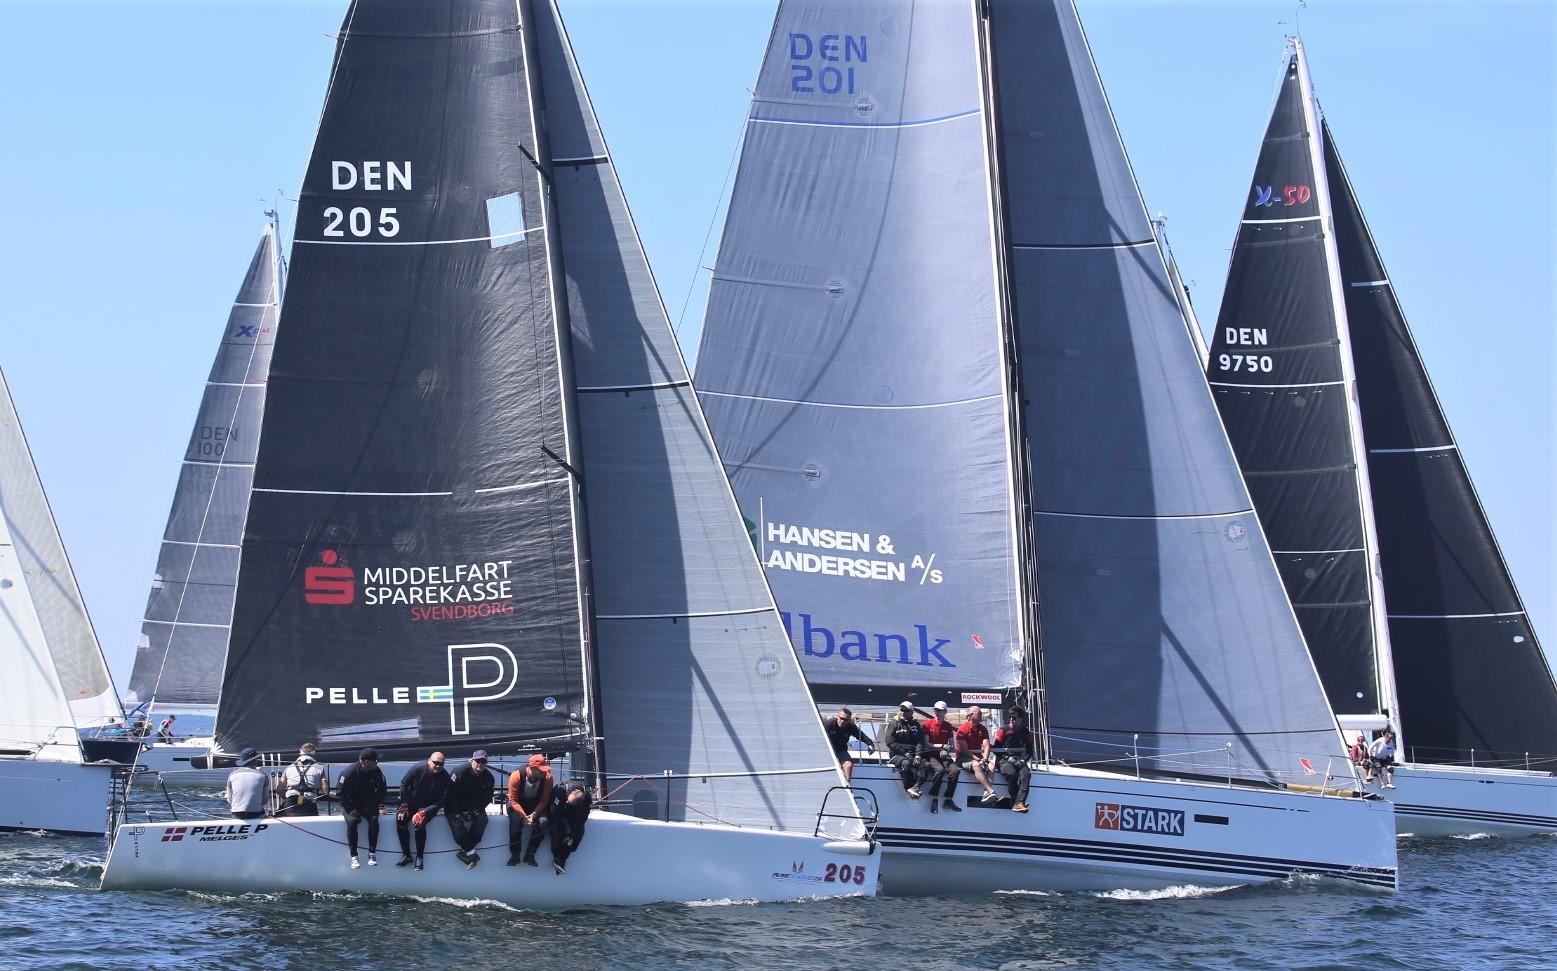 Melges 32eren vandt starten og kæmper her med Stony, en Xp44 fra Næstved. Foto: Minbaad.dk/Kristian B. Møller